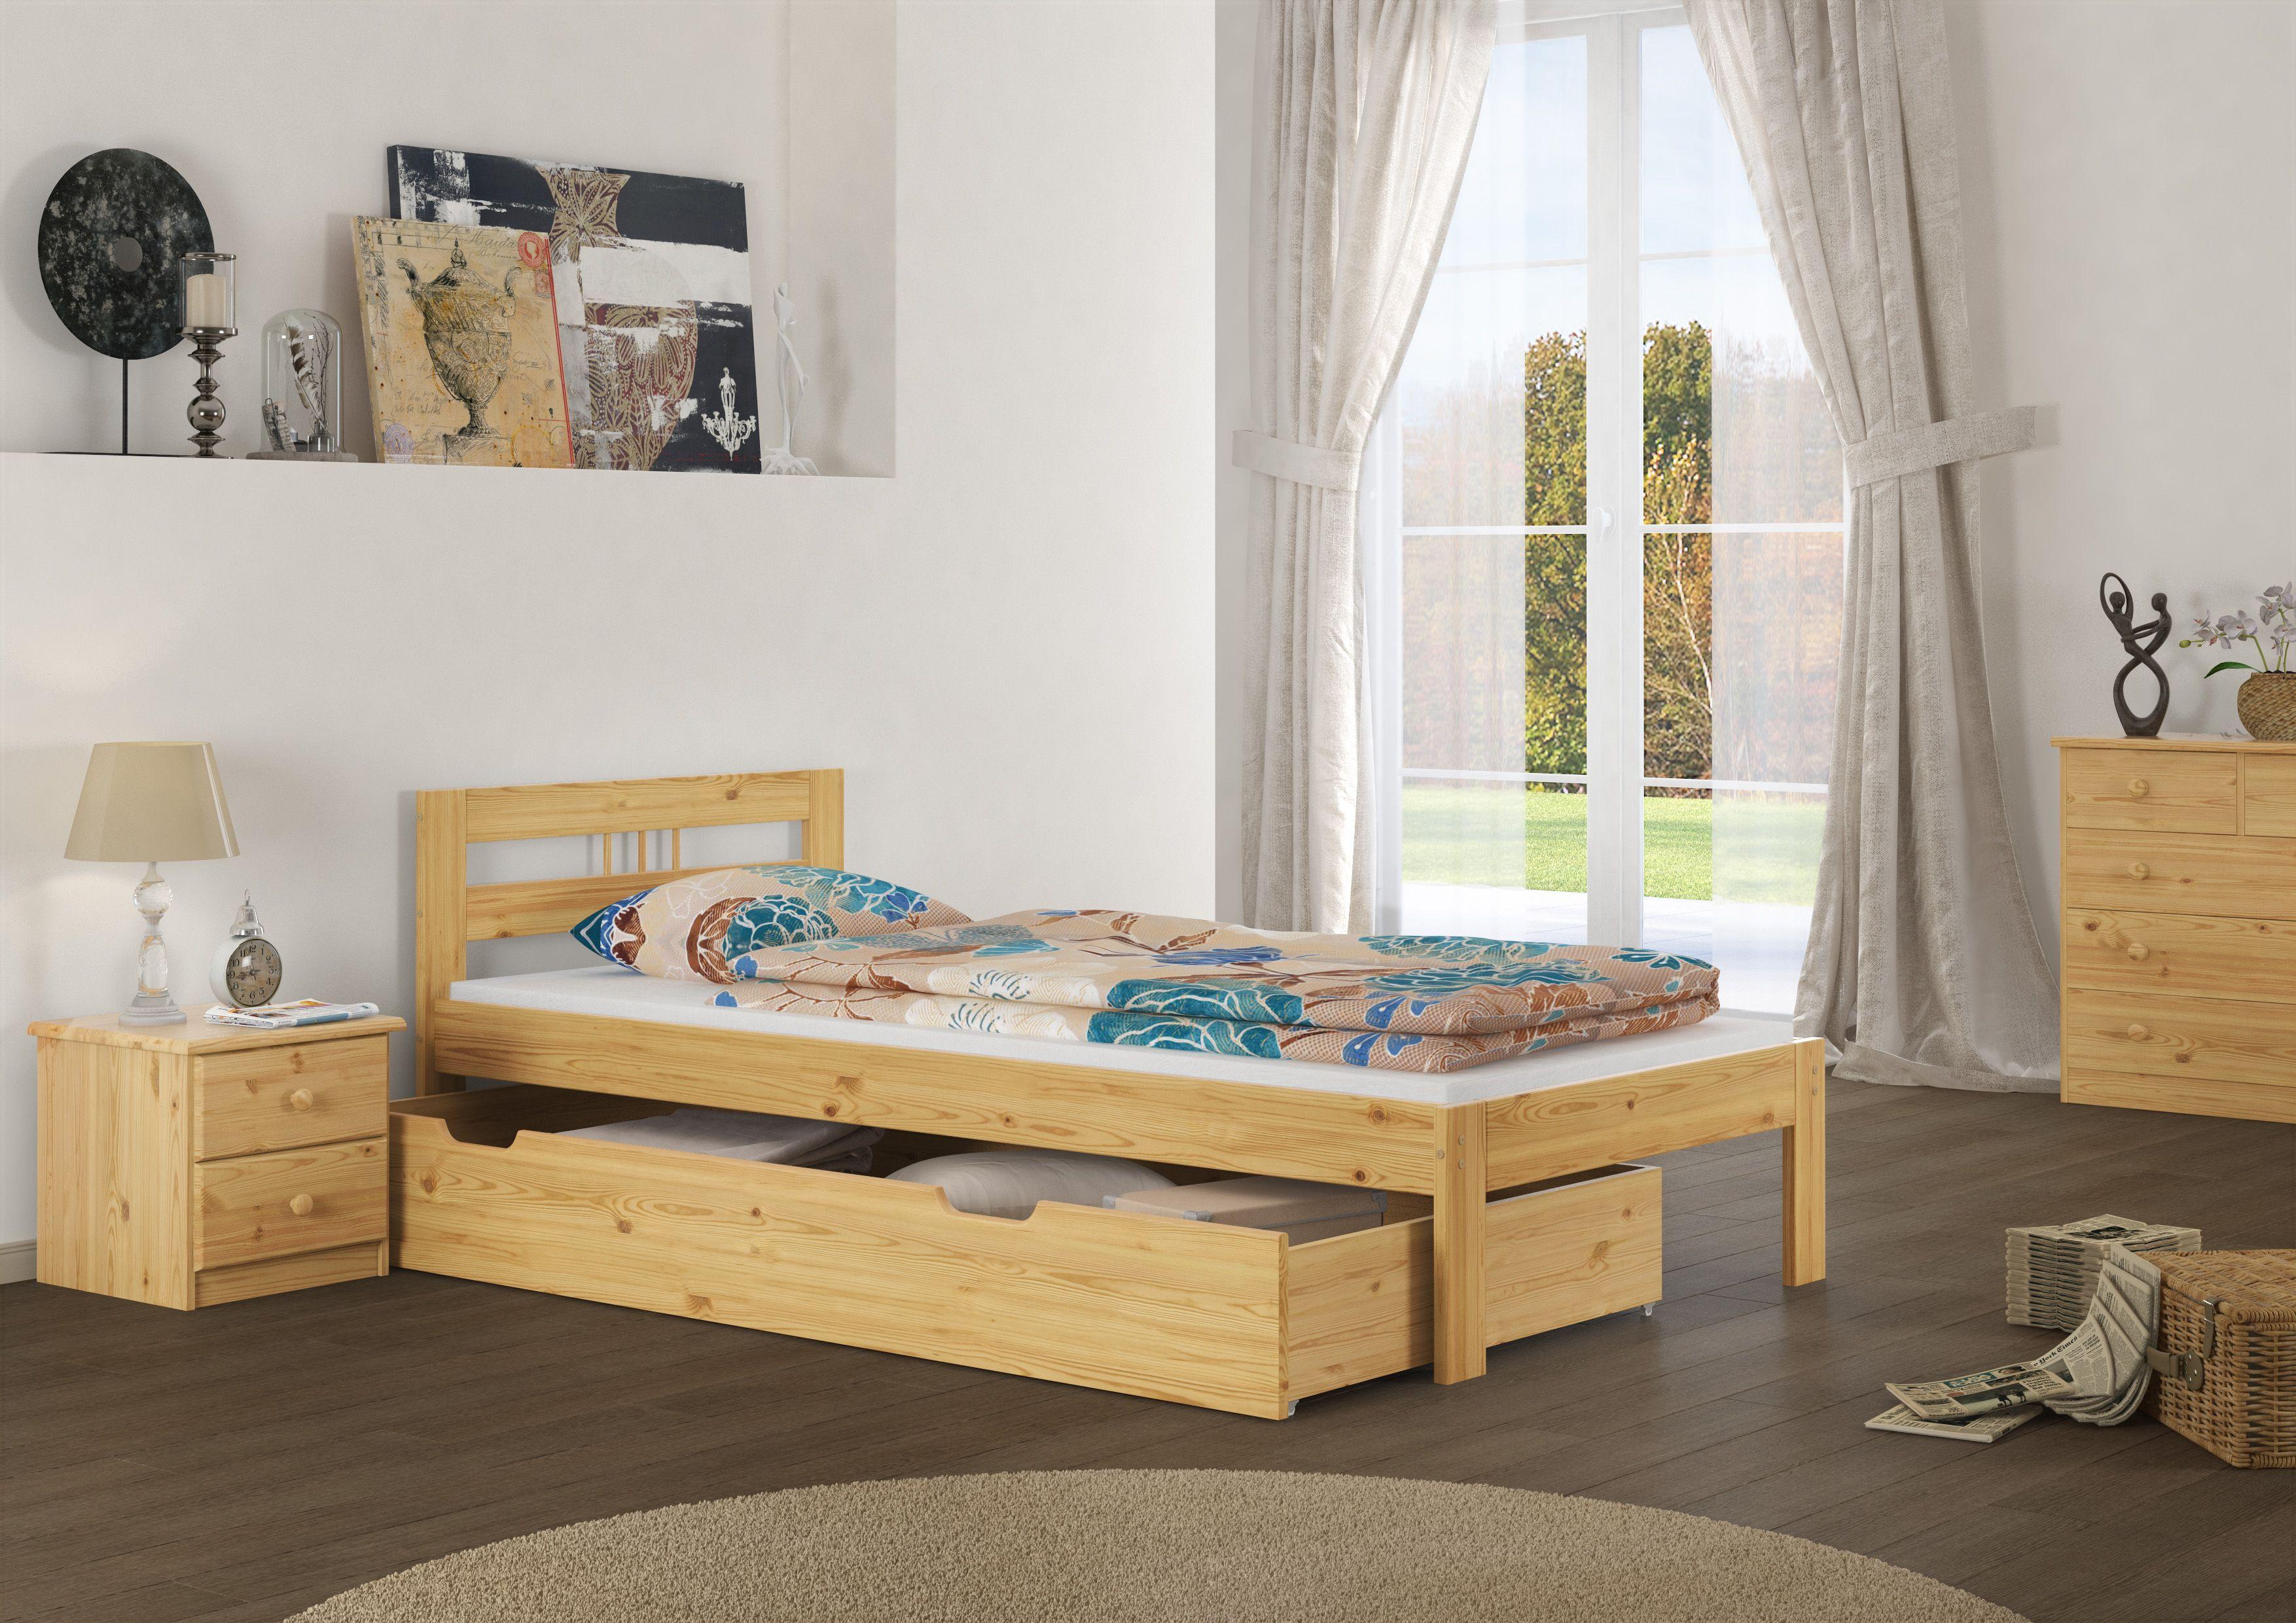 Schones Holzbett Aus Kiefer Gefertigt Einzelbett Bett Ideen Kieferbett